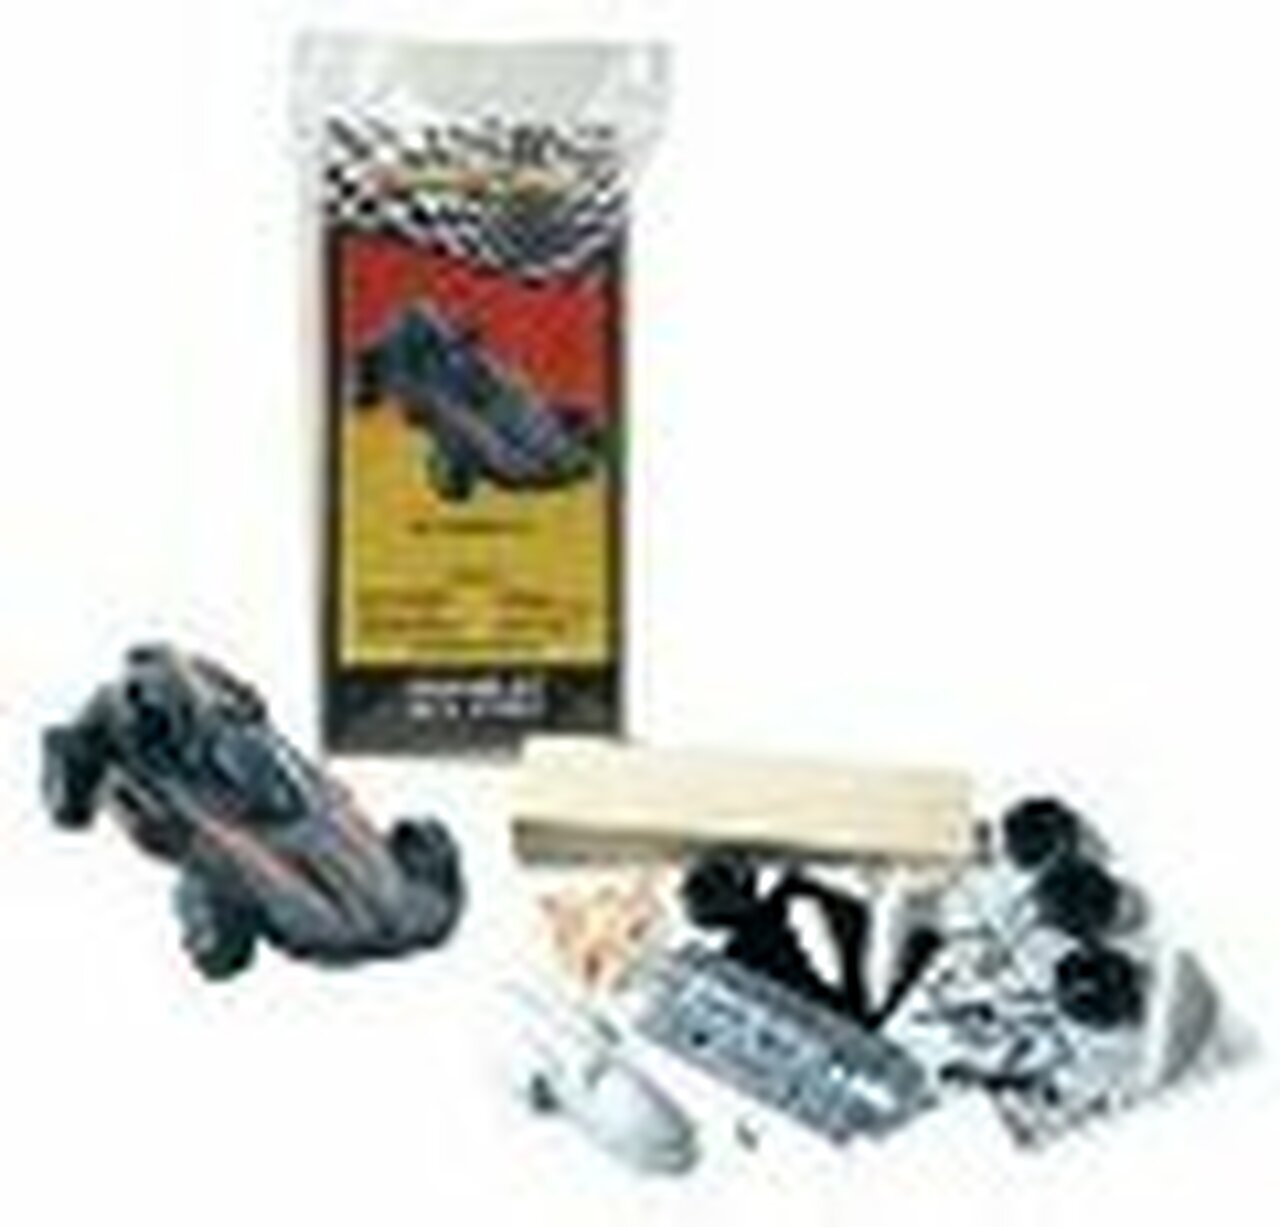 Pinewood Derby Kits and Blocks